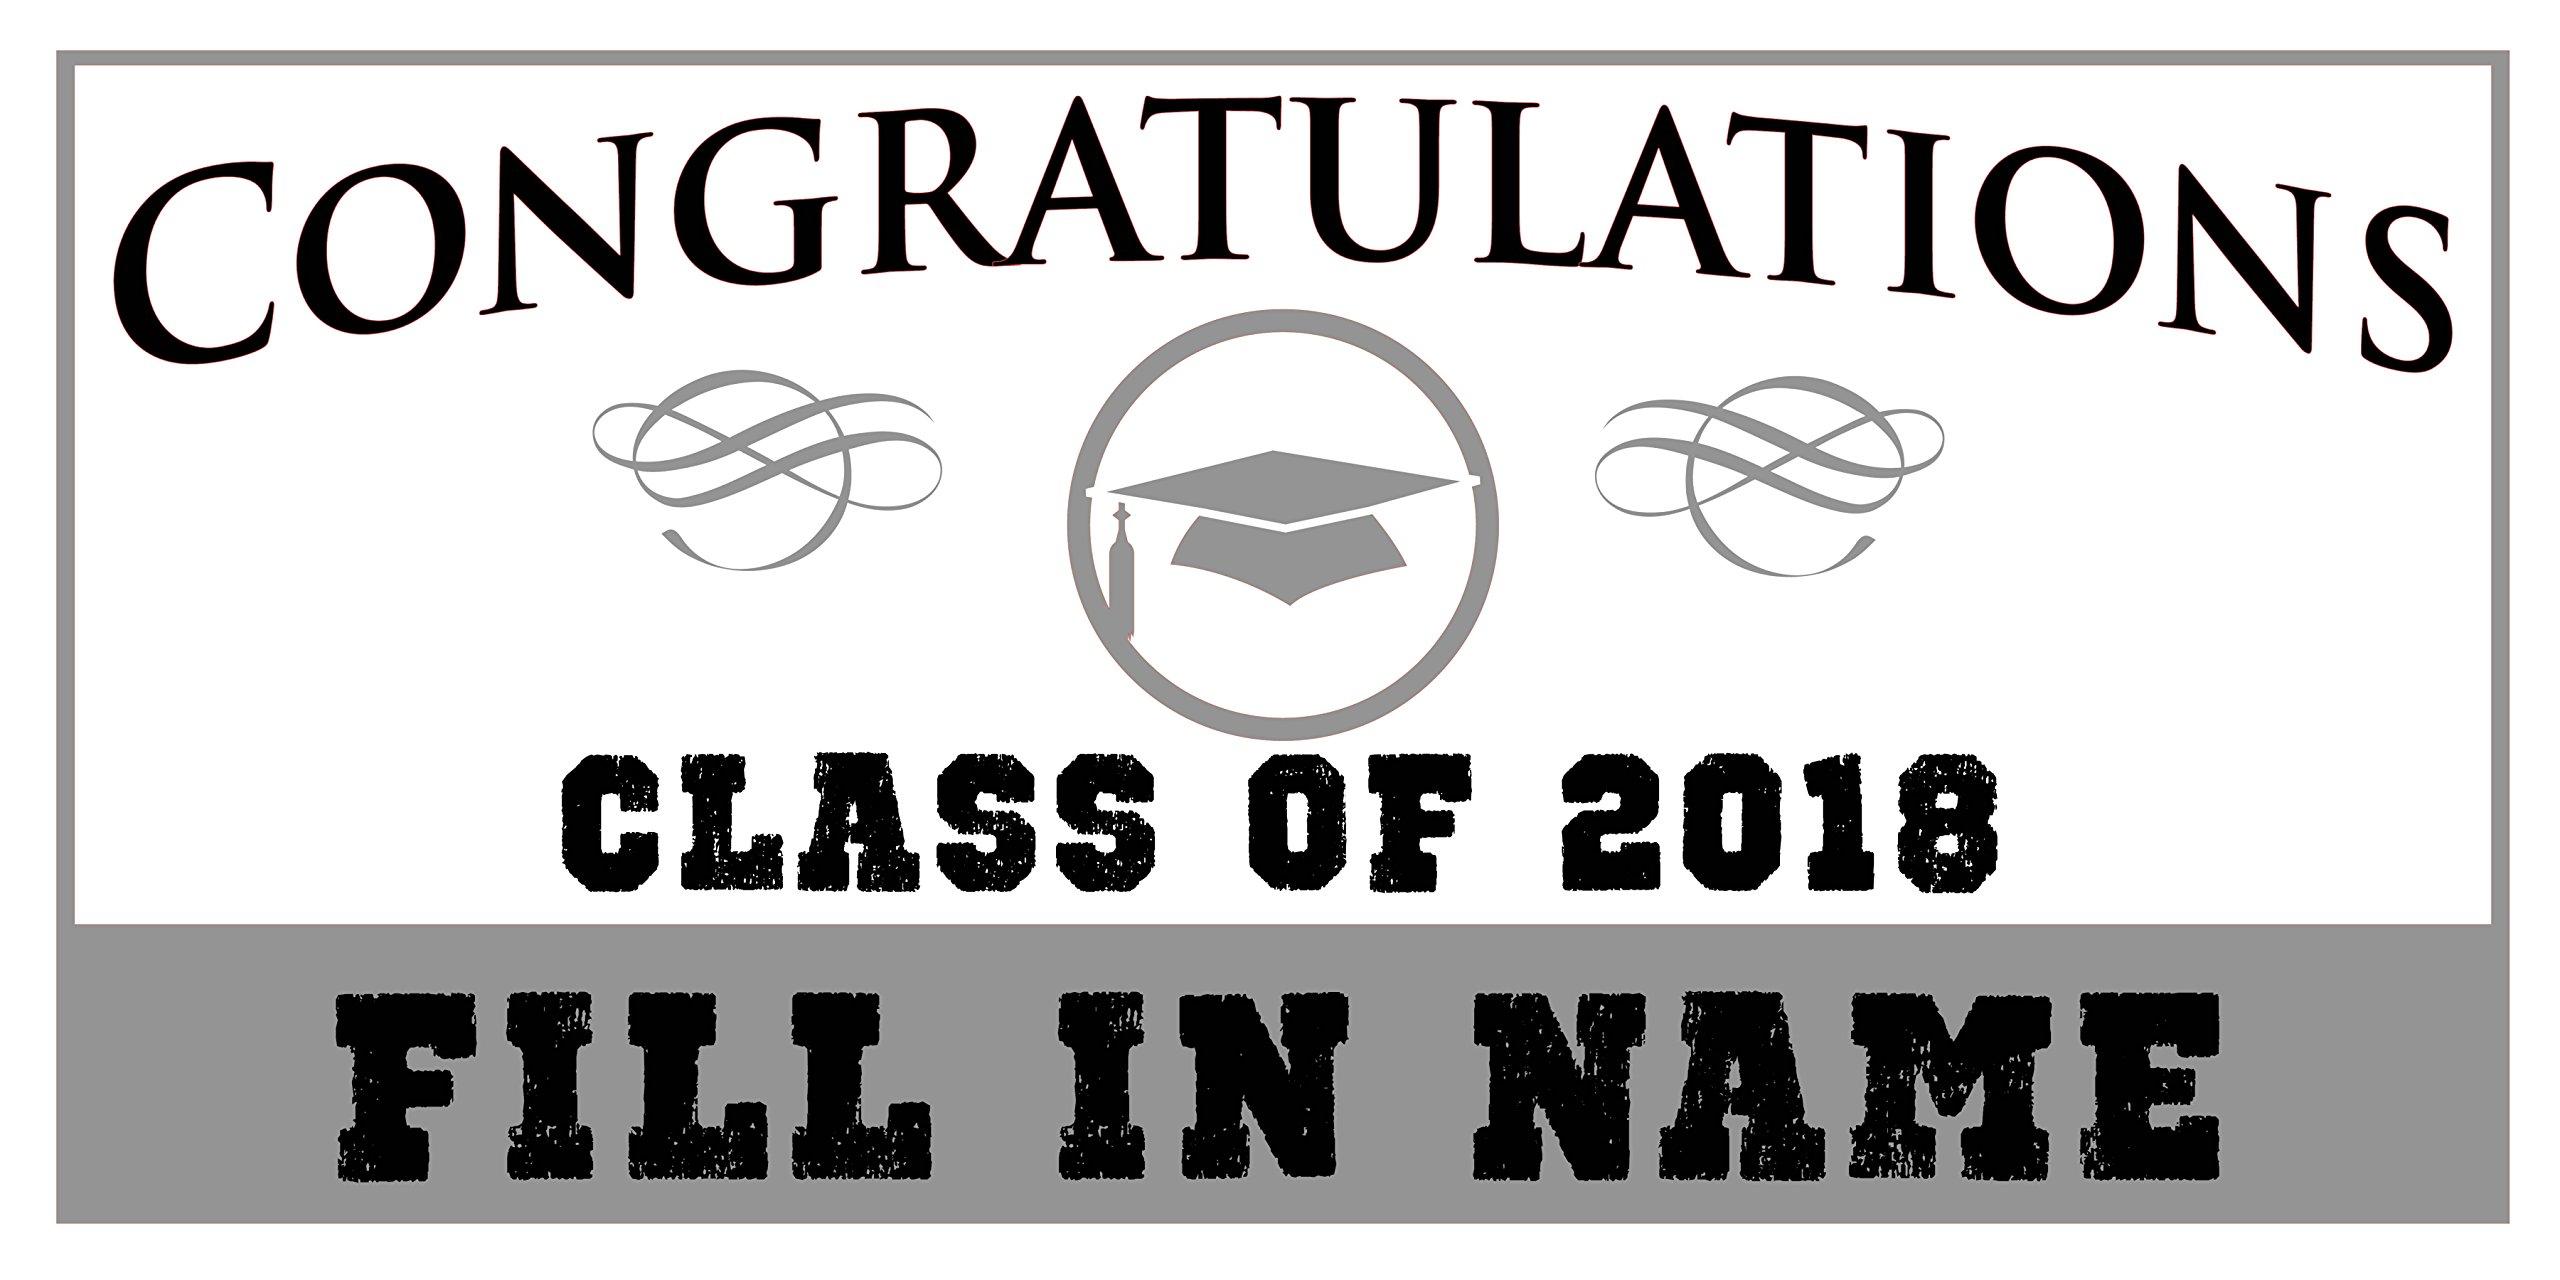 Custom Printed Graduation Banner Congratulations - Hat Gray (10' x 5')